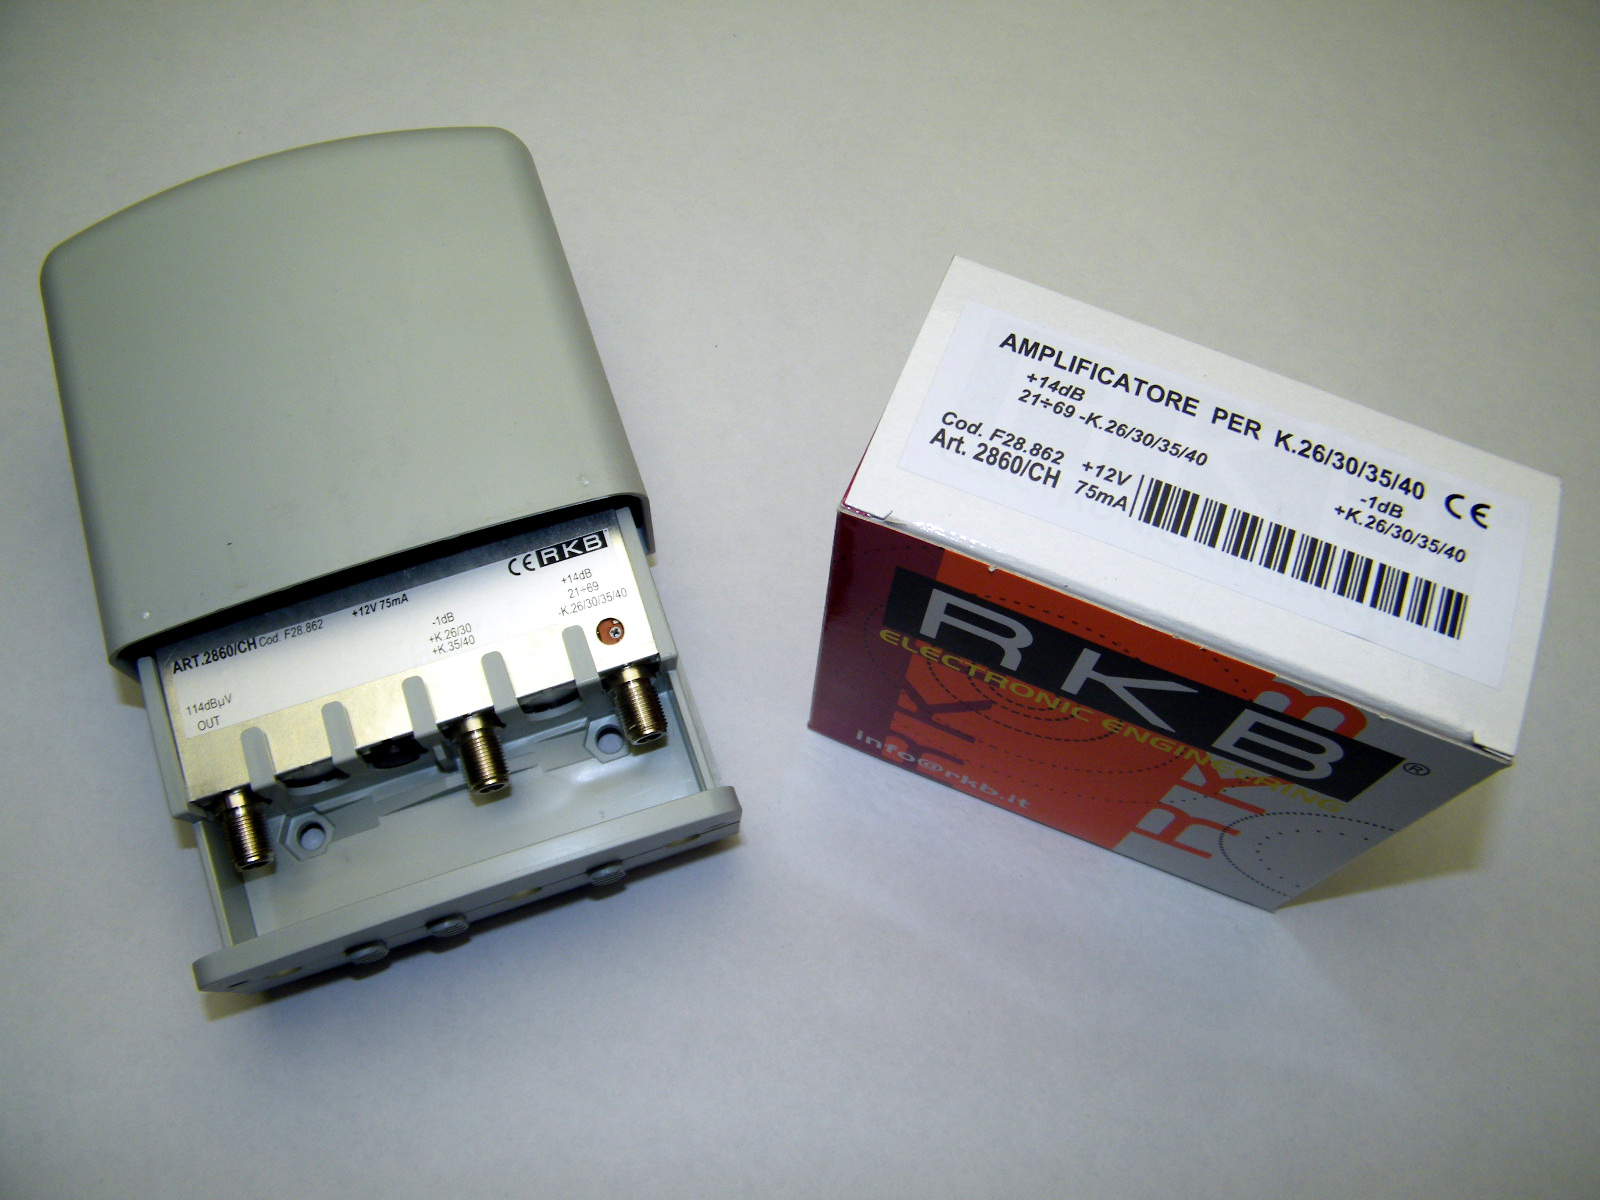 Amplificatore x 4 Mux Rai 26,30,35,40 14dB UHF-K/K -1dB 114dBuV 75mA 2860CH